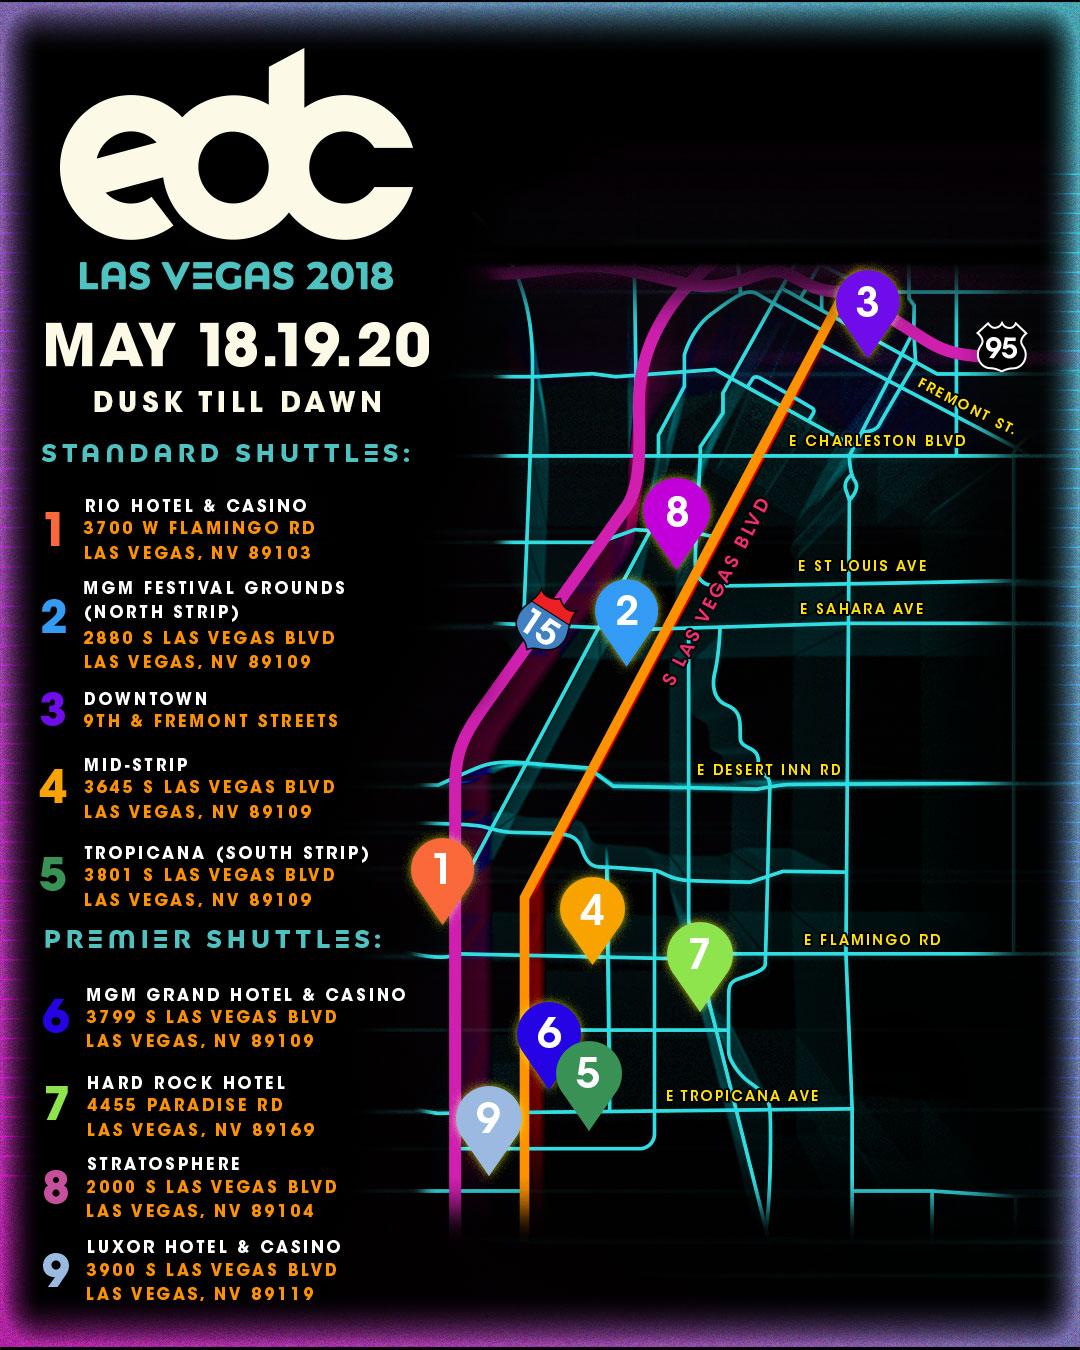 EDC Las Vegas 2018 shuttle map